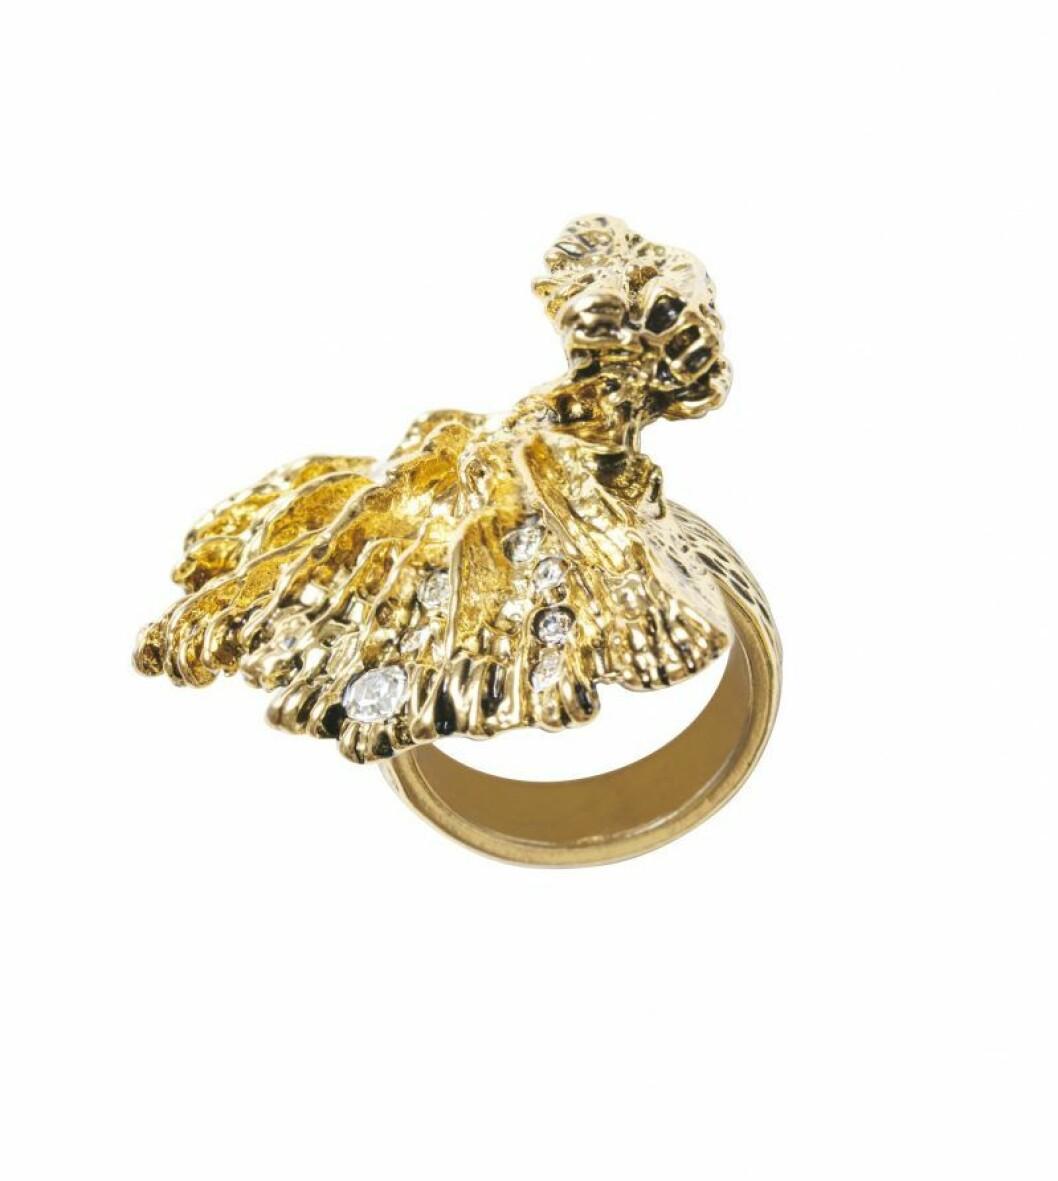 H&M Conscious Exclusive SS20 guldfärgad ring